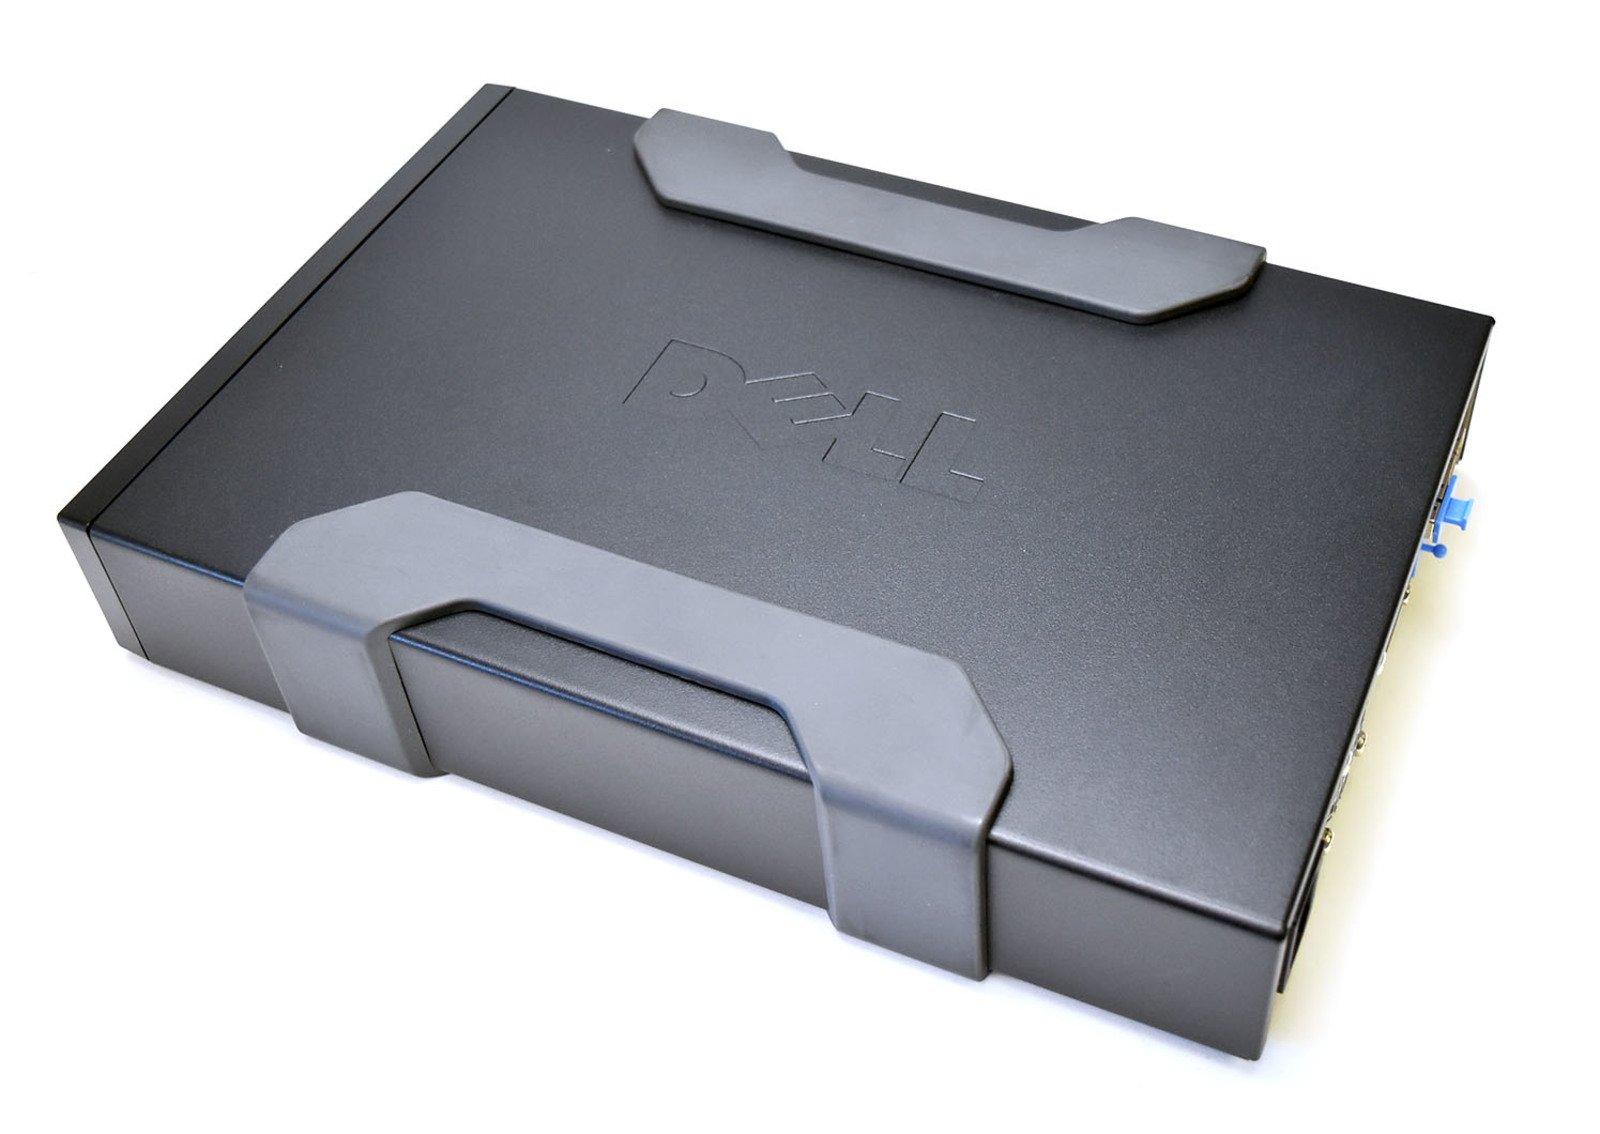 New 41FKW Genuine OEM Dell PowerVault PV110T PV114 LTO3 46C2885 TBU Native 400GB Tape Back-up Unit External Half-High CSEH 001 External LTO3-080 SAS Tape Drive 5NR27 9N0P4 HKP50 KKM03